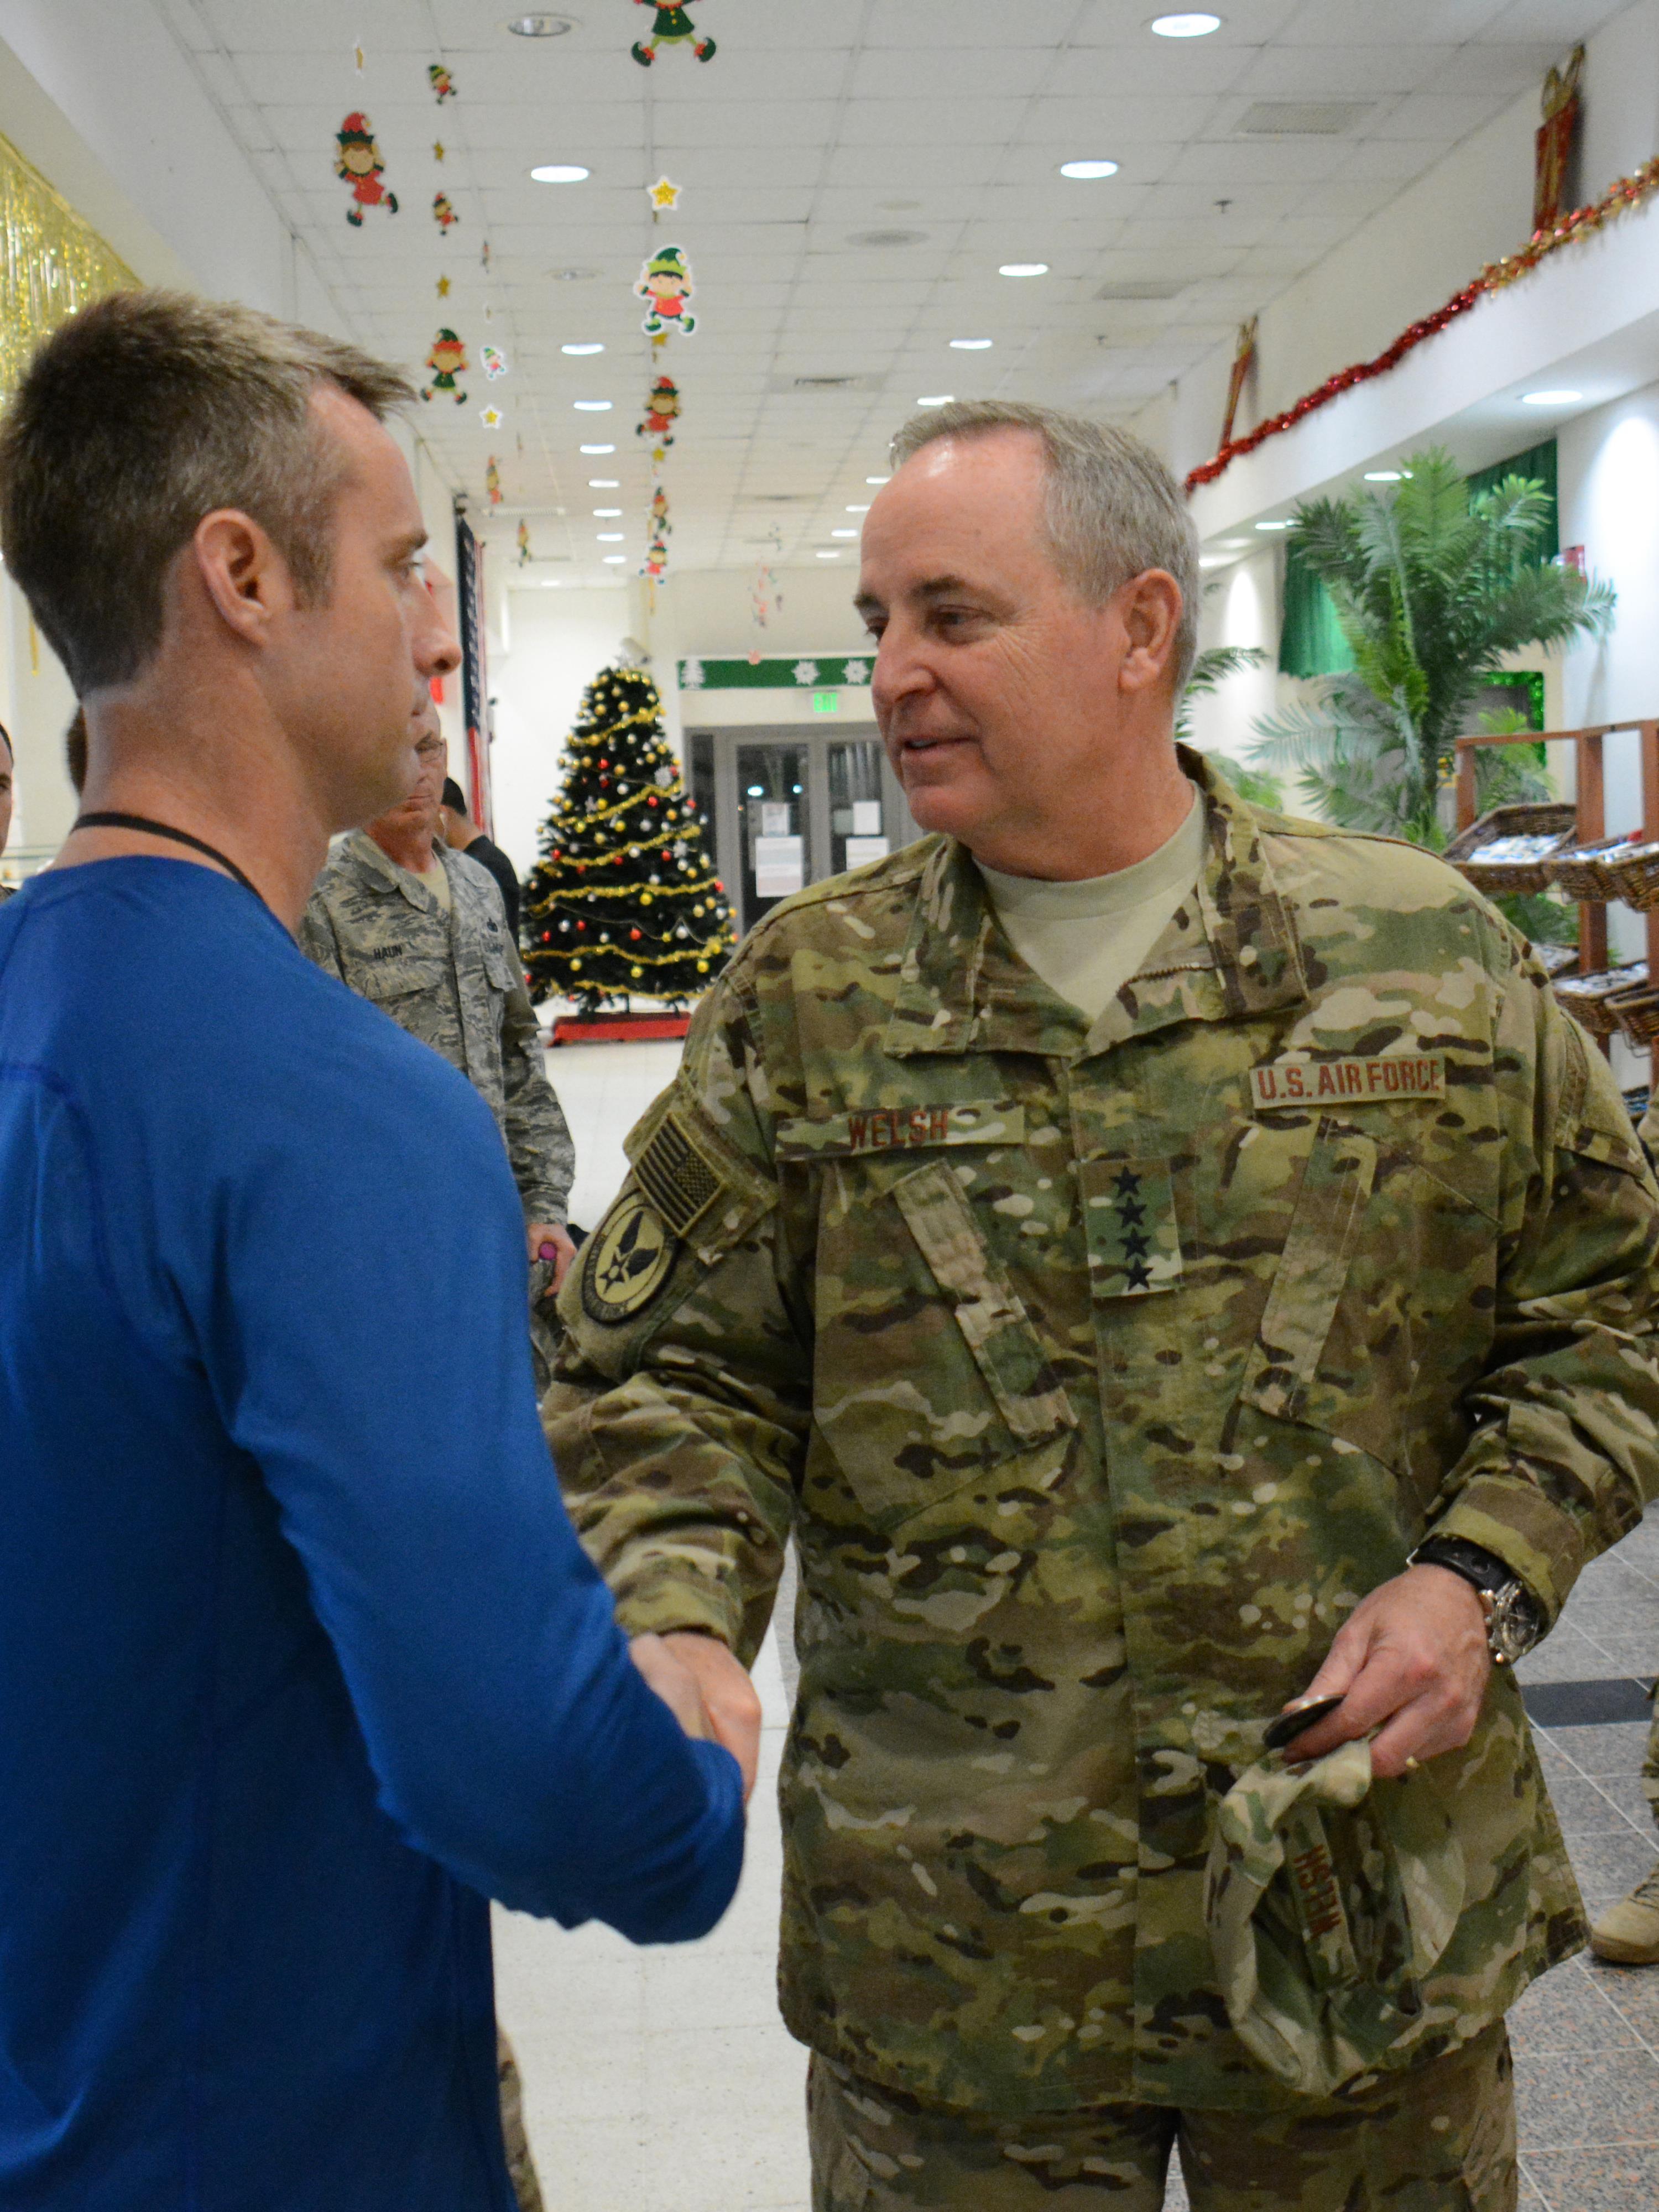 Csaf Cmsaf Bring Message Of Thanks To Deployed Airmen